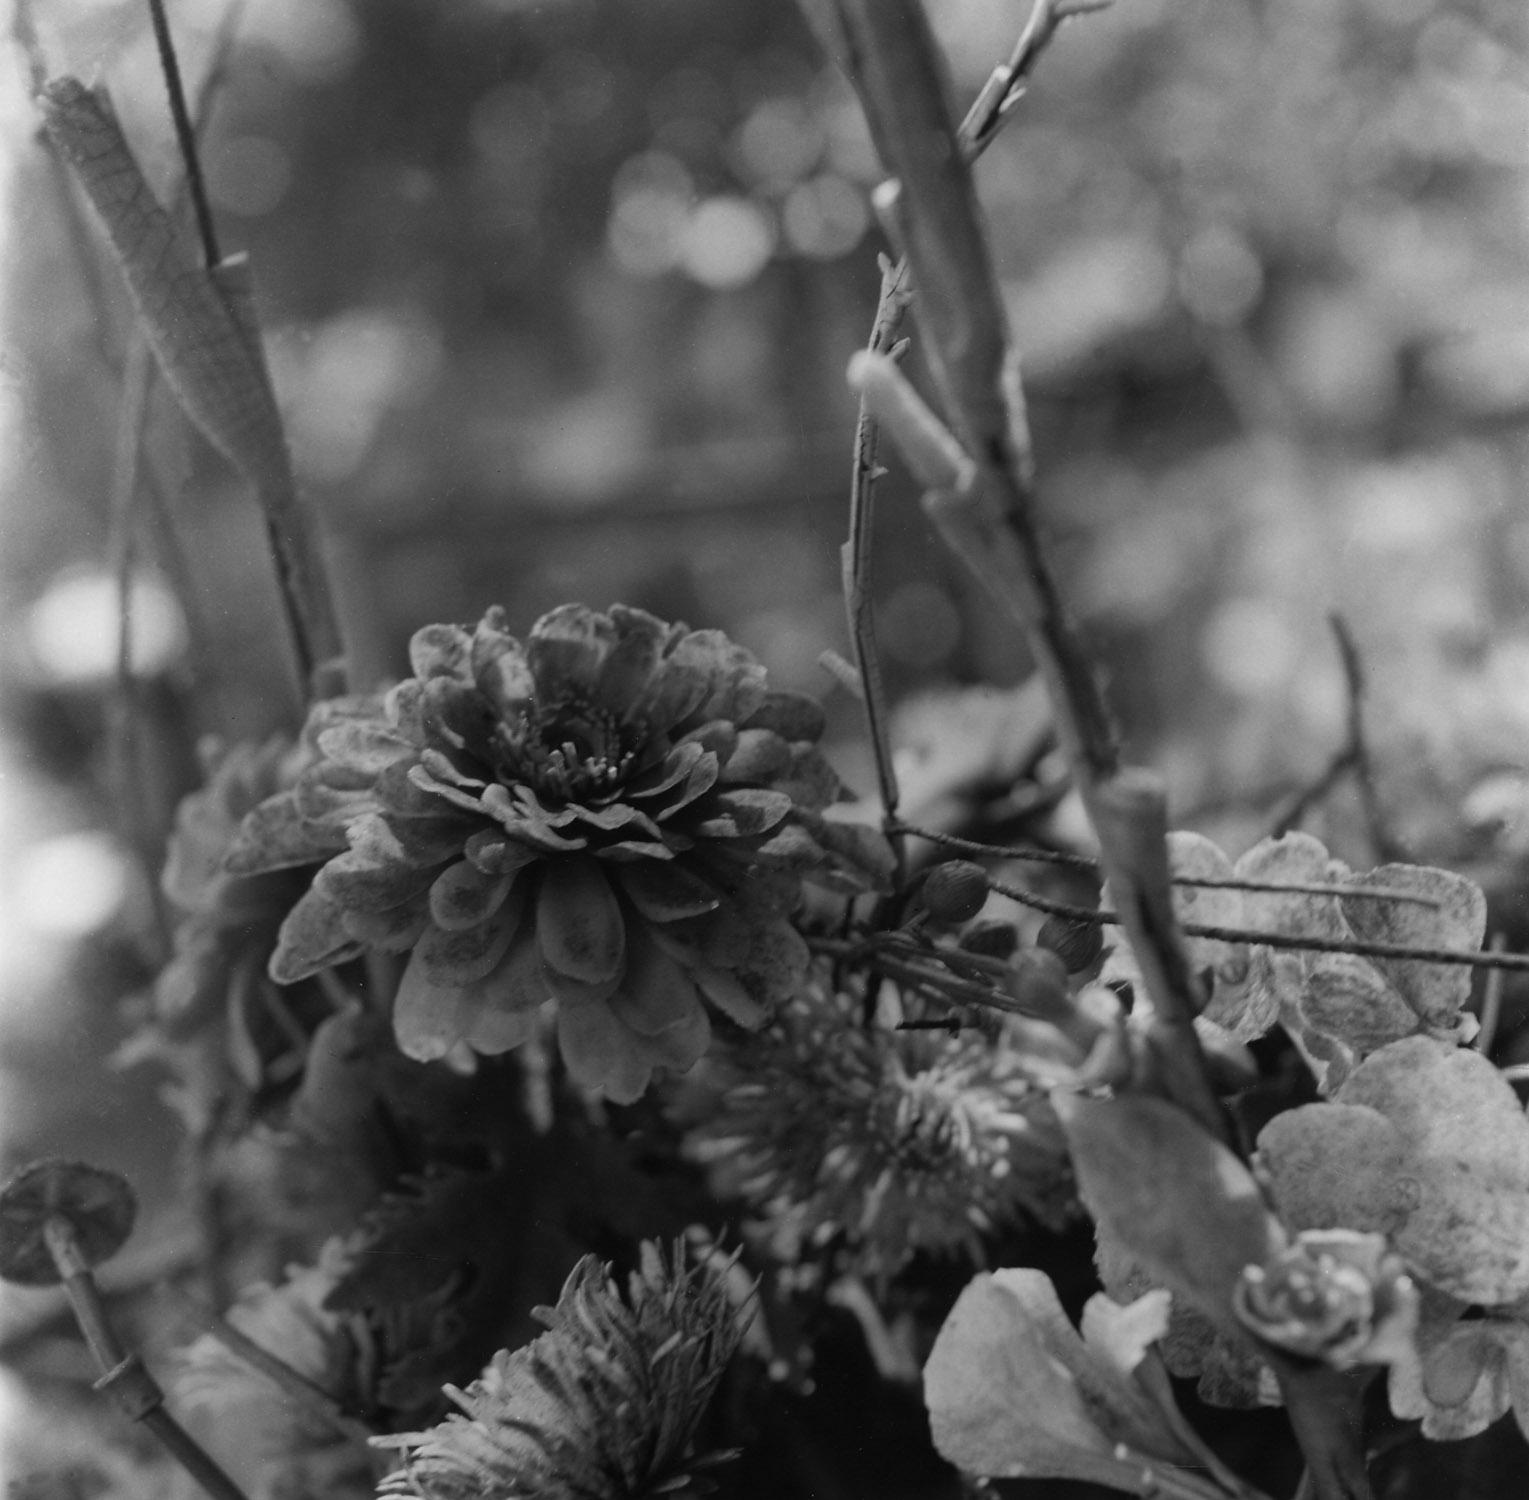 Flowers, Holyland USA.13